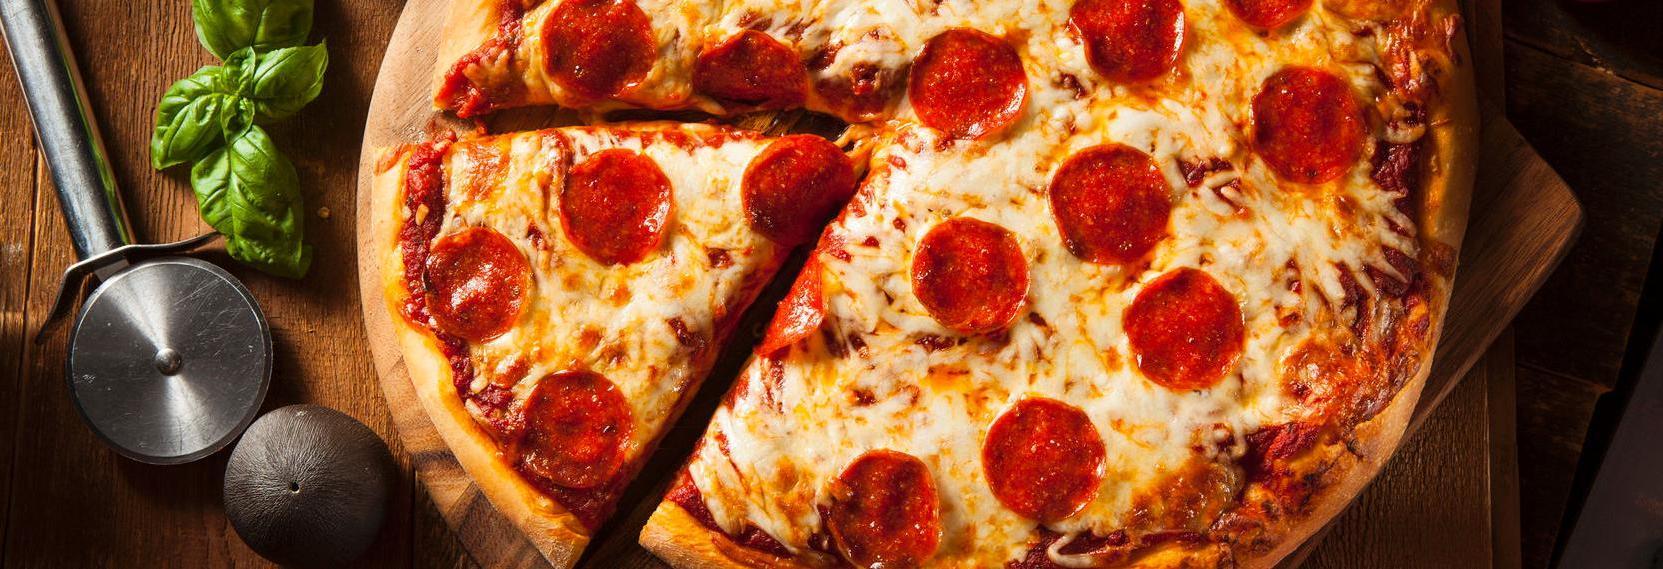 Fast Pizza in San Leandro, California banner ad